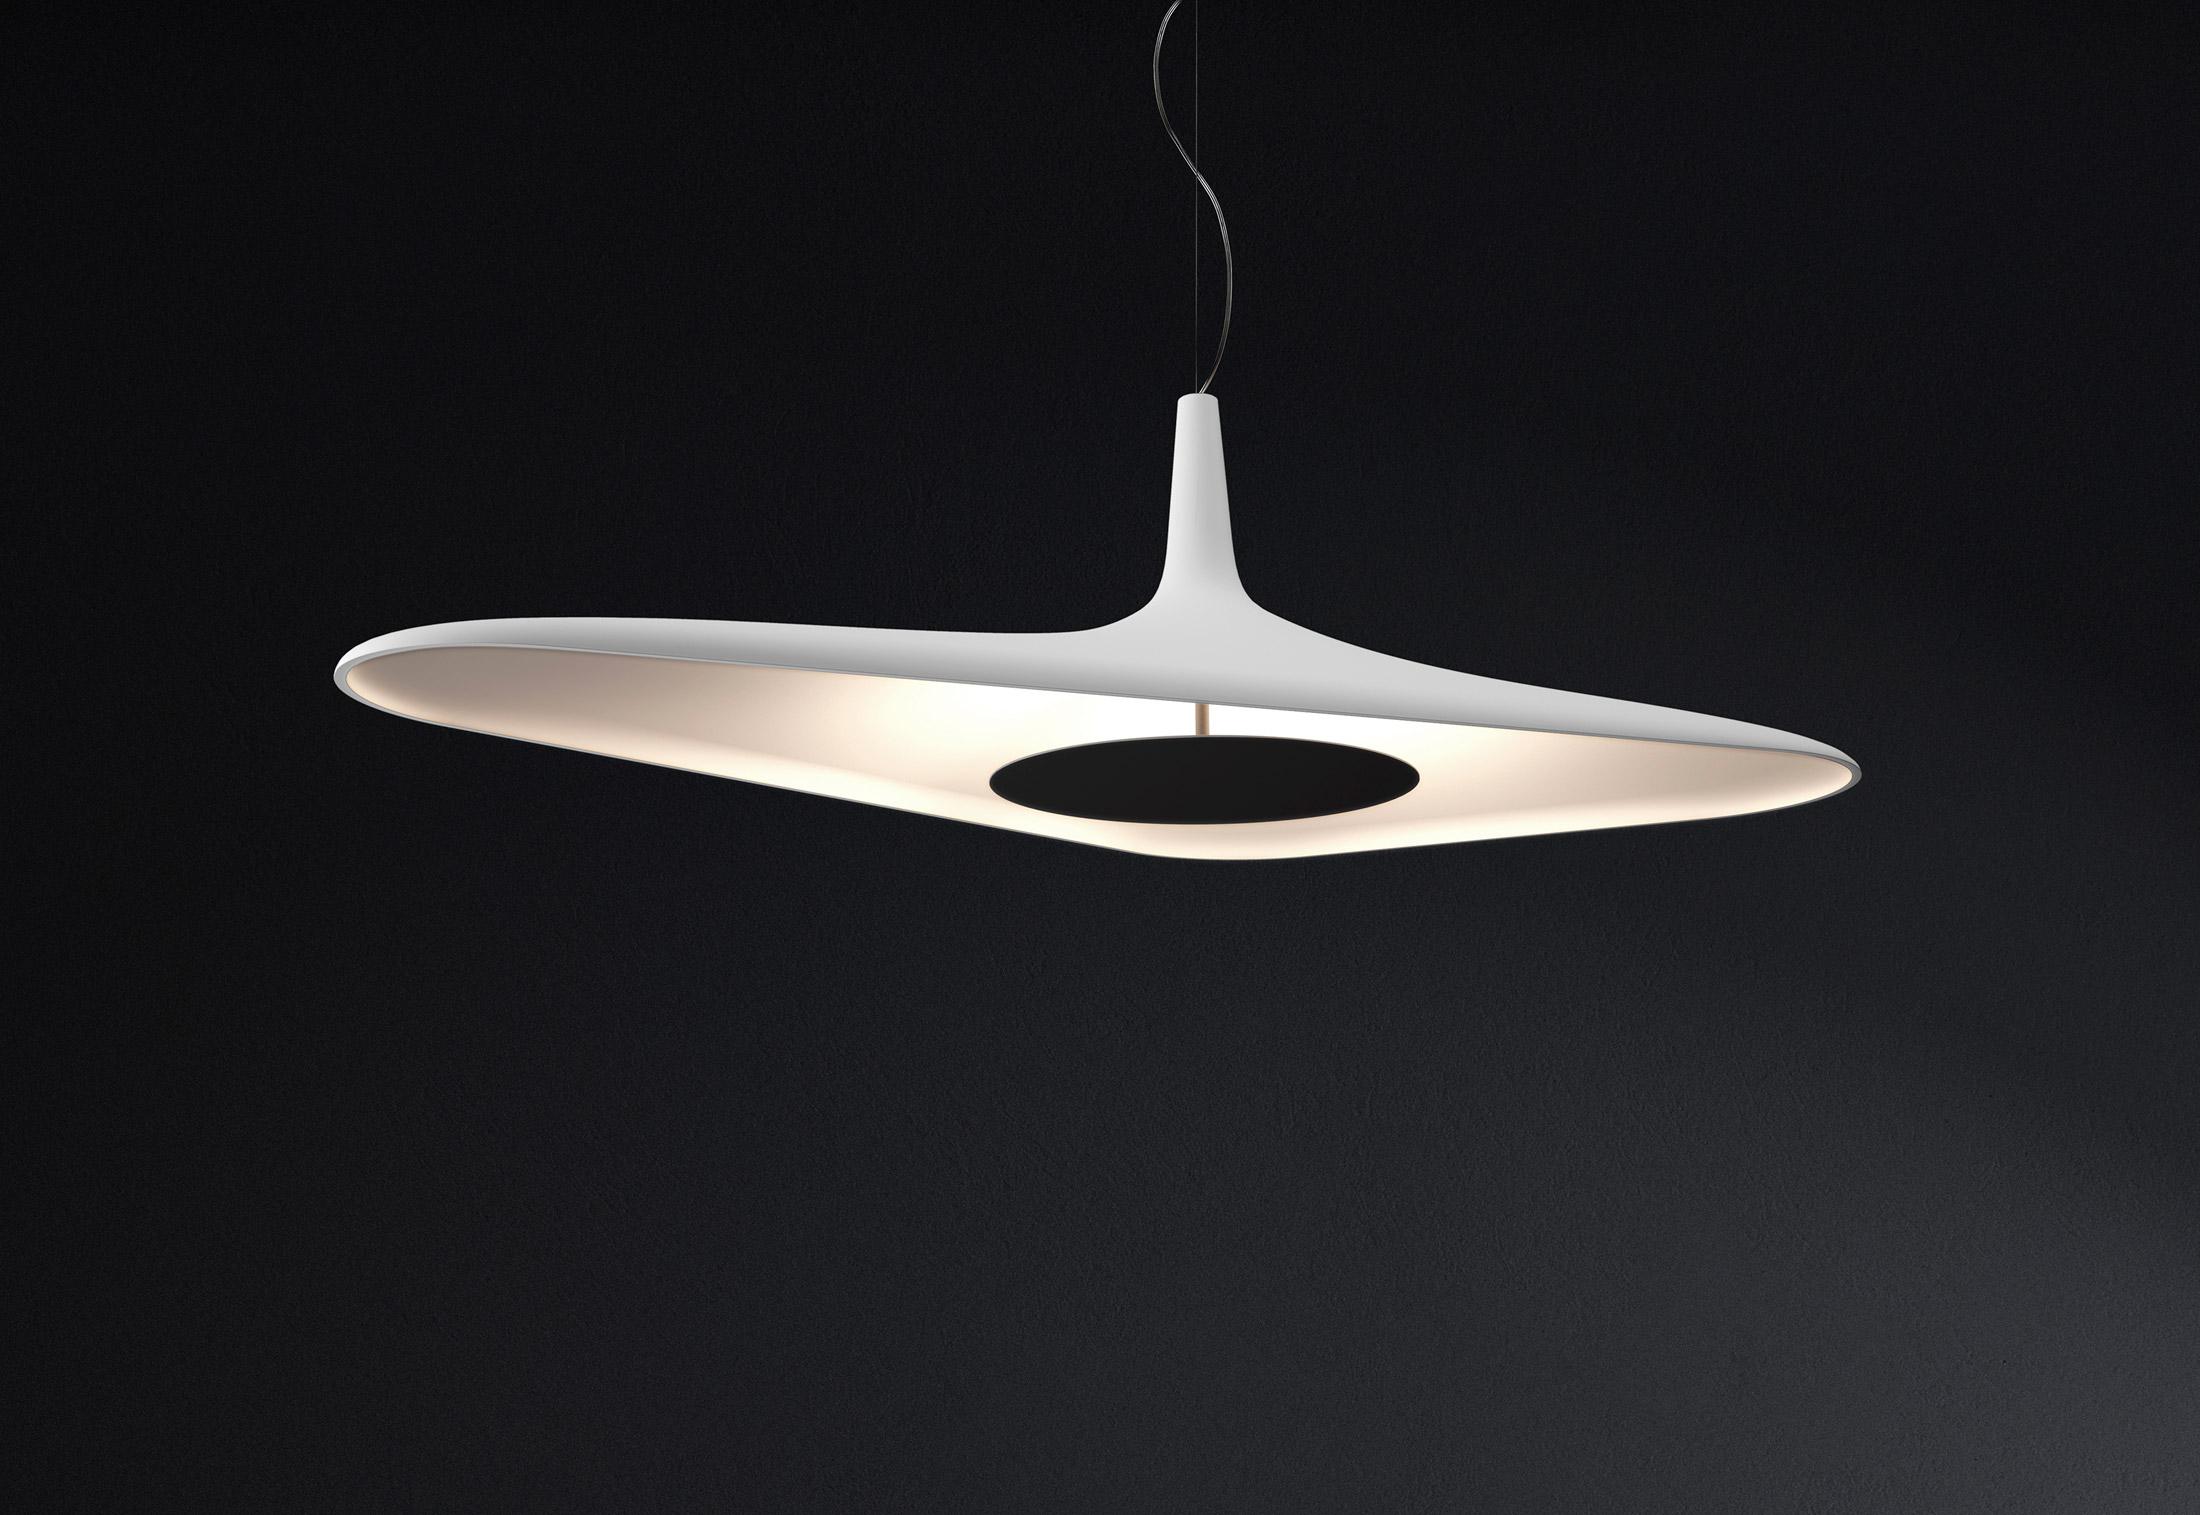 Soleil Noir Lamp by Odile Decq for Luceplan